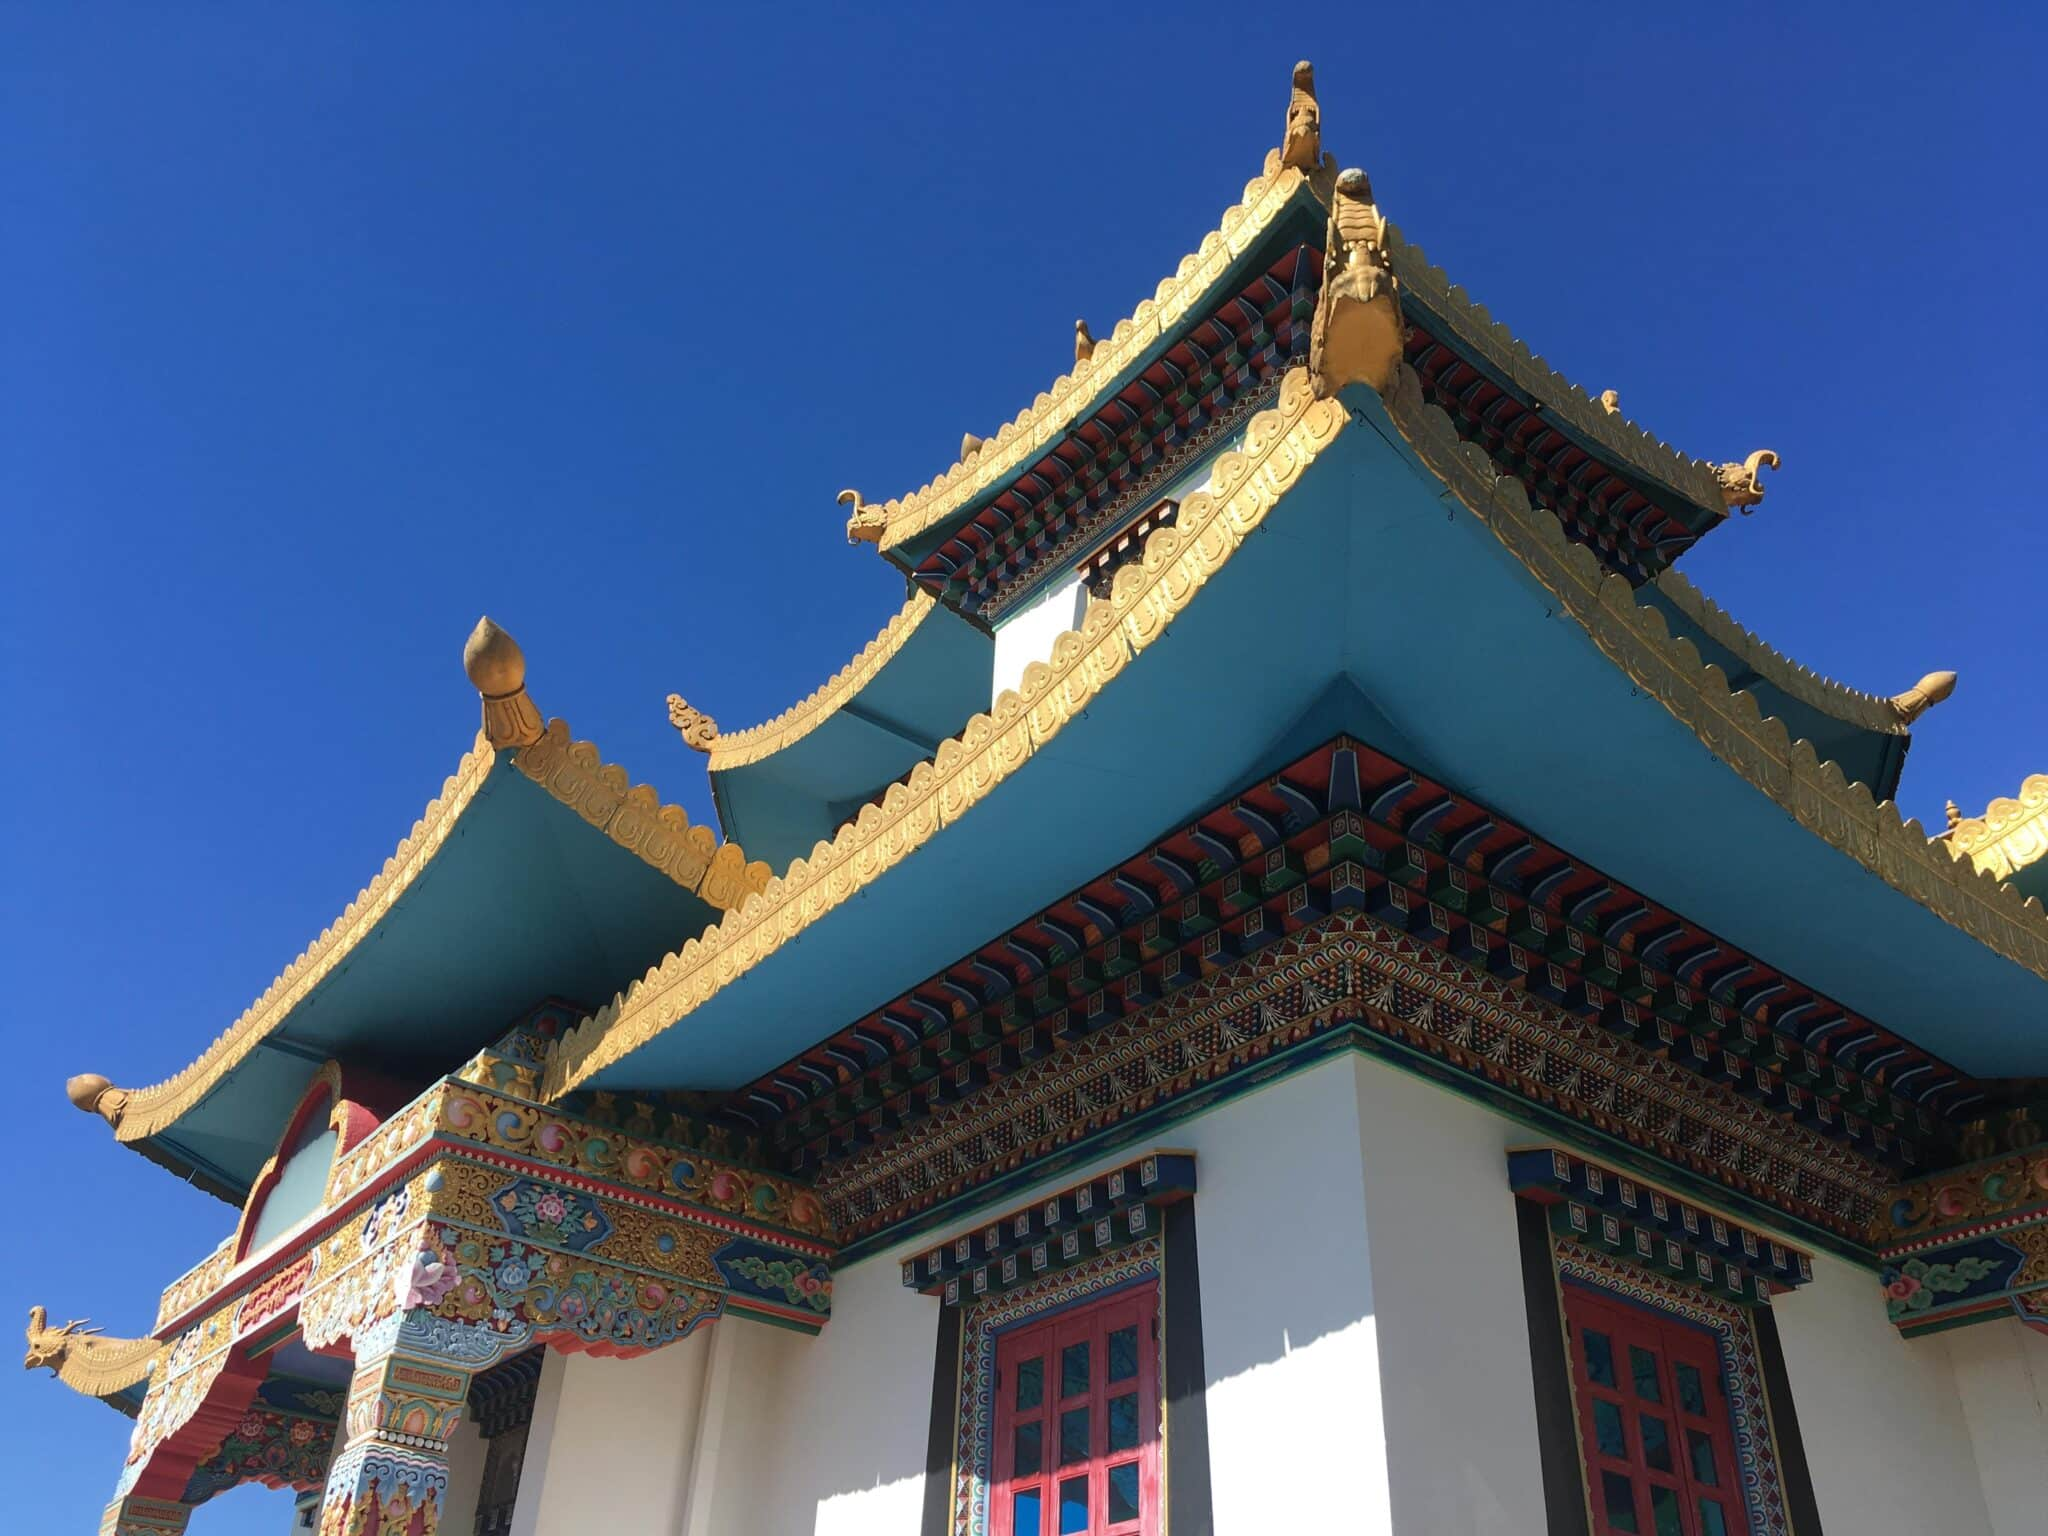 templo budista no brasil khadro ling terra pura detalhe 2